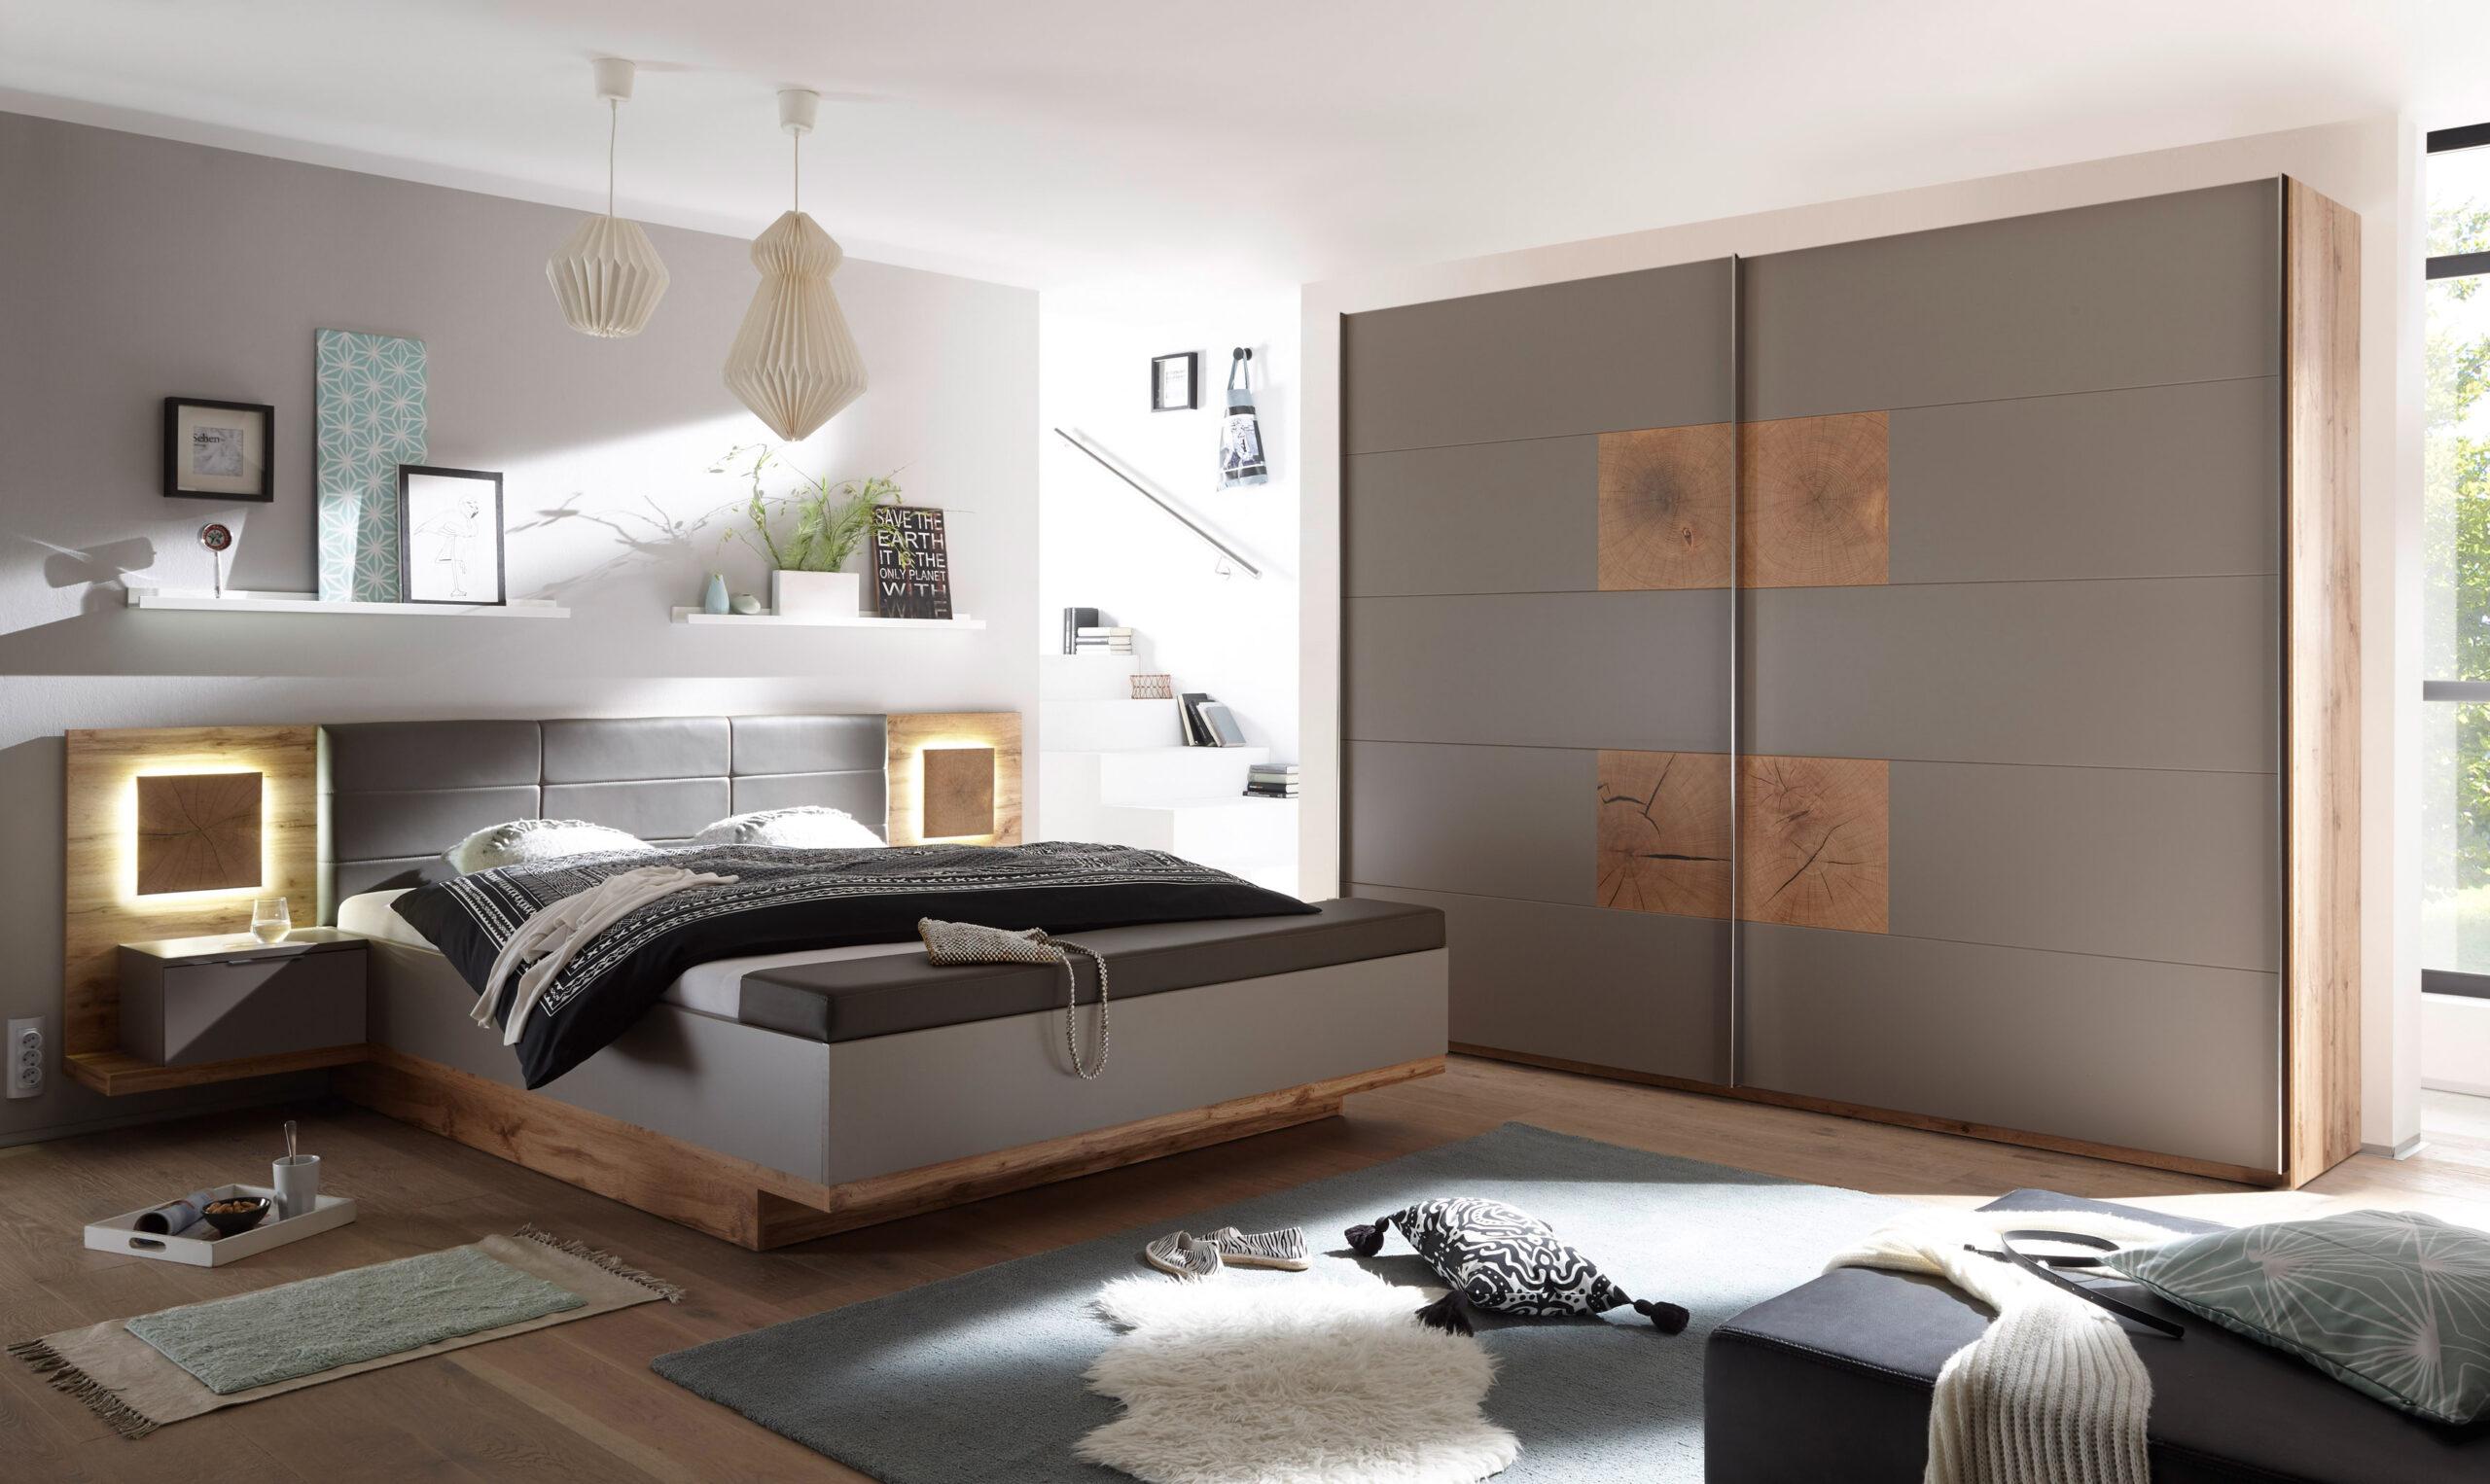 Full Size of Luxus Schlafzimmer Komplett Modern Massiv Set Weiss 4 Tlg Capri Xl Bett 180 Kleiderschrank Günstig Massivholz Küche Holz Komplettküche Bad Komplettset Mit Wohnzimmer Schlafzimmer Komplett Modern